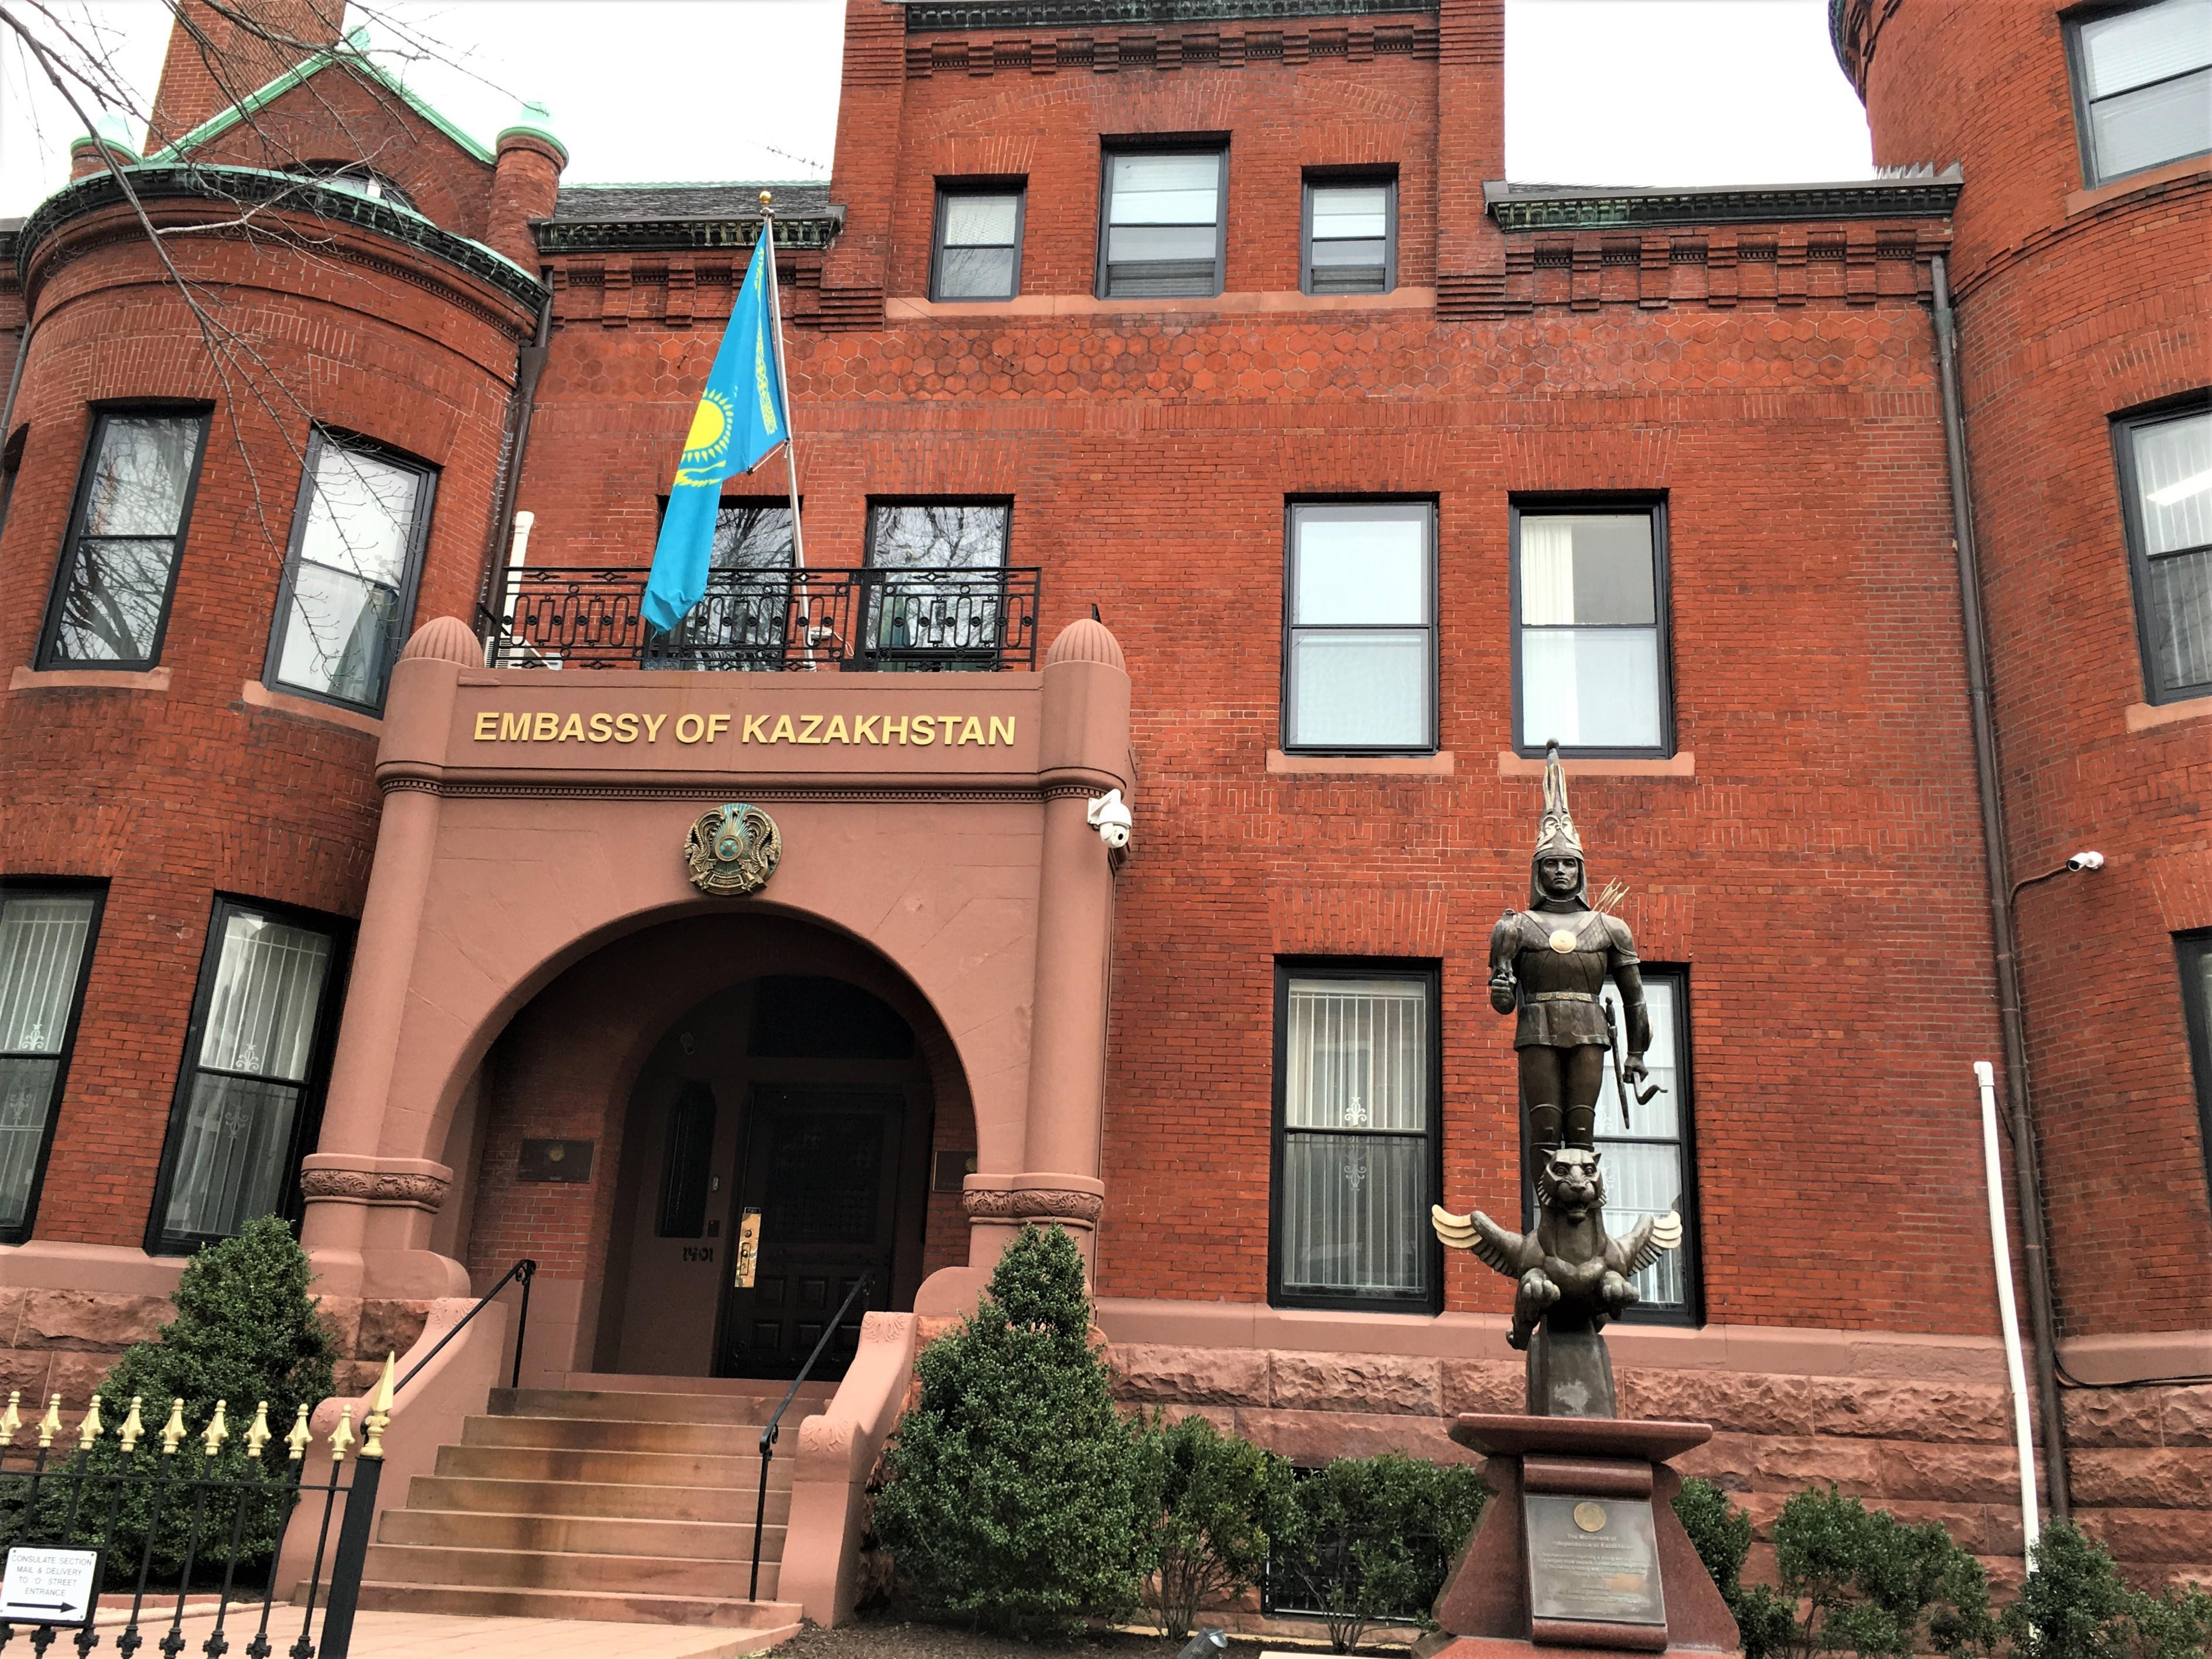 Real Estate & Homes For Sale Near The Embassy of Kazakhstan in Washington, DC. Artyom Shmatko Realtor